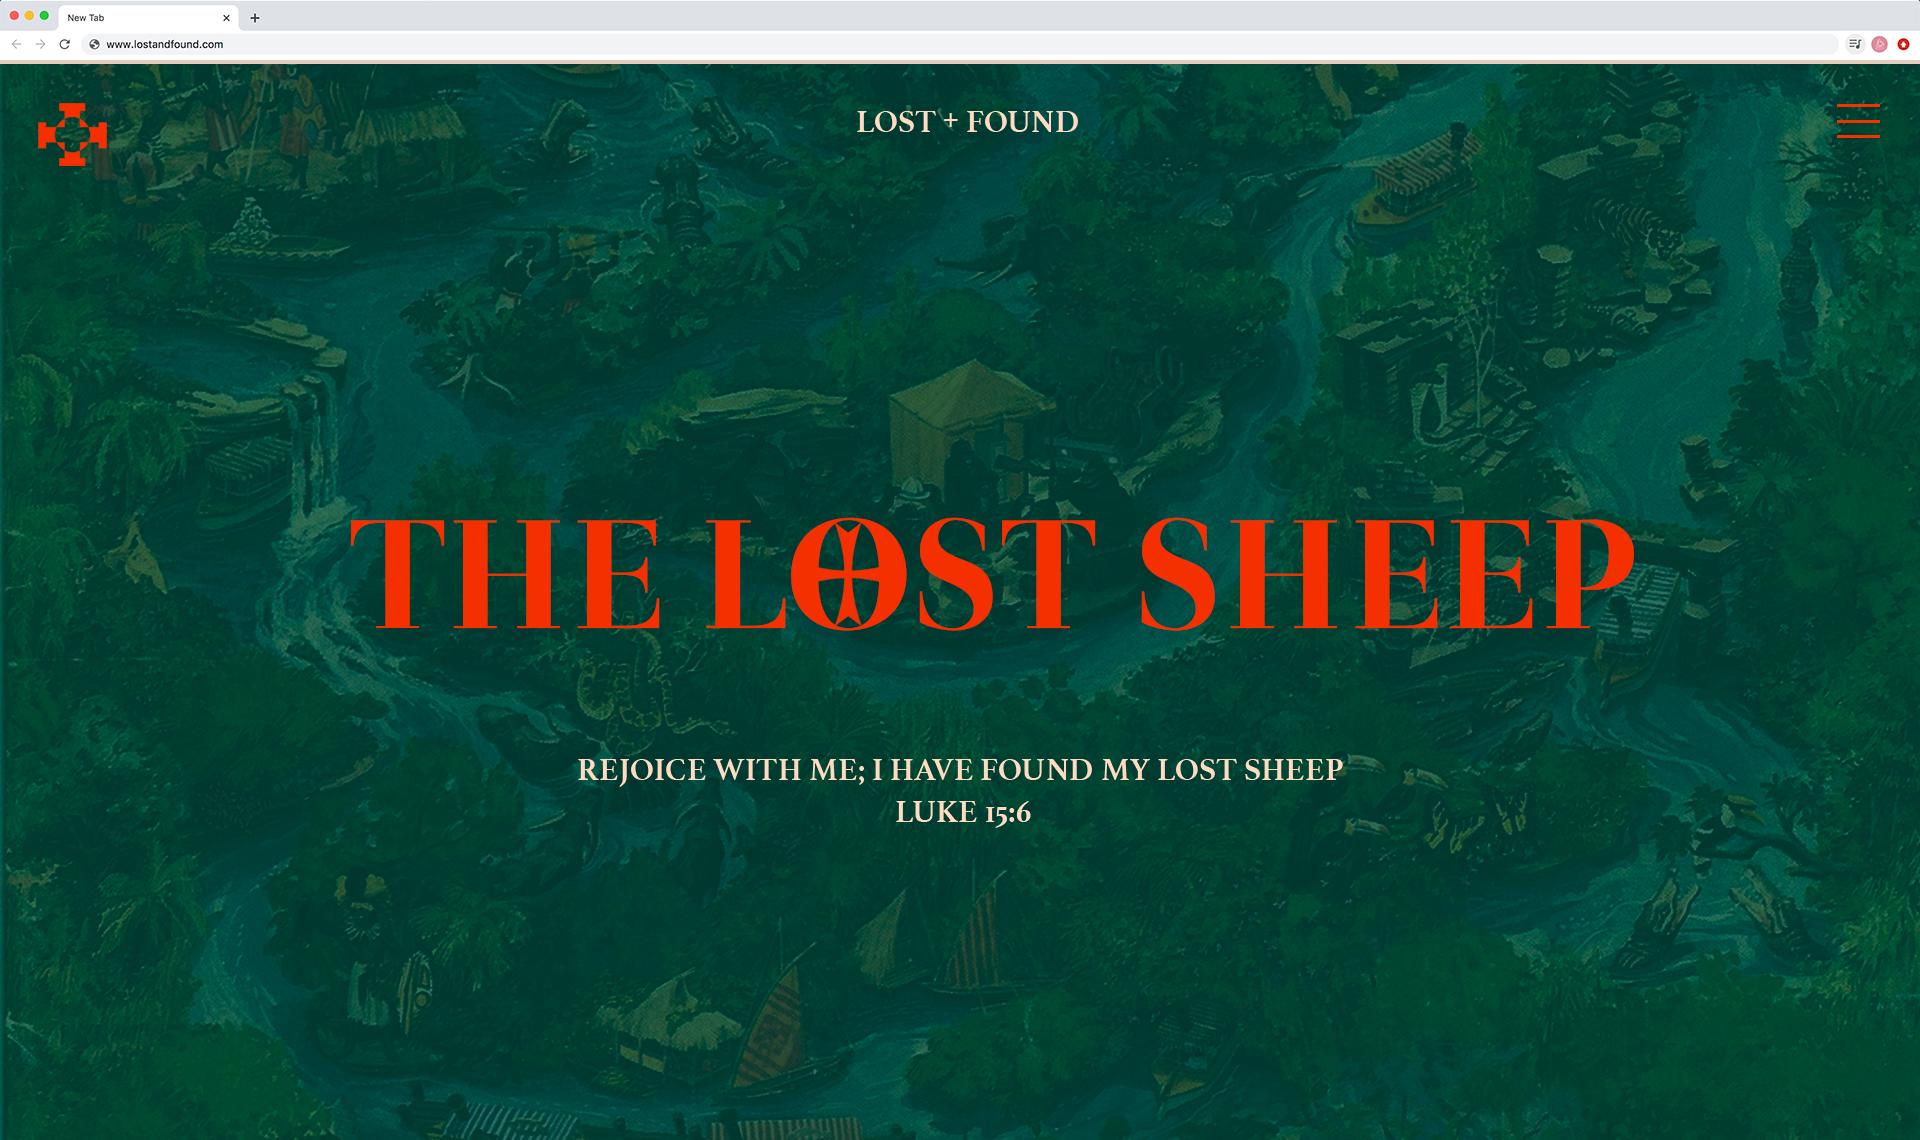 LostAndFound_Web_01.png